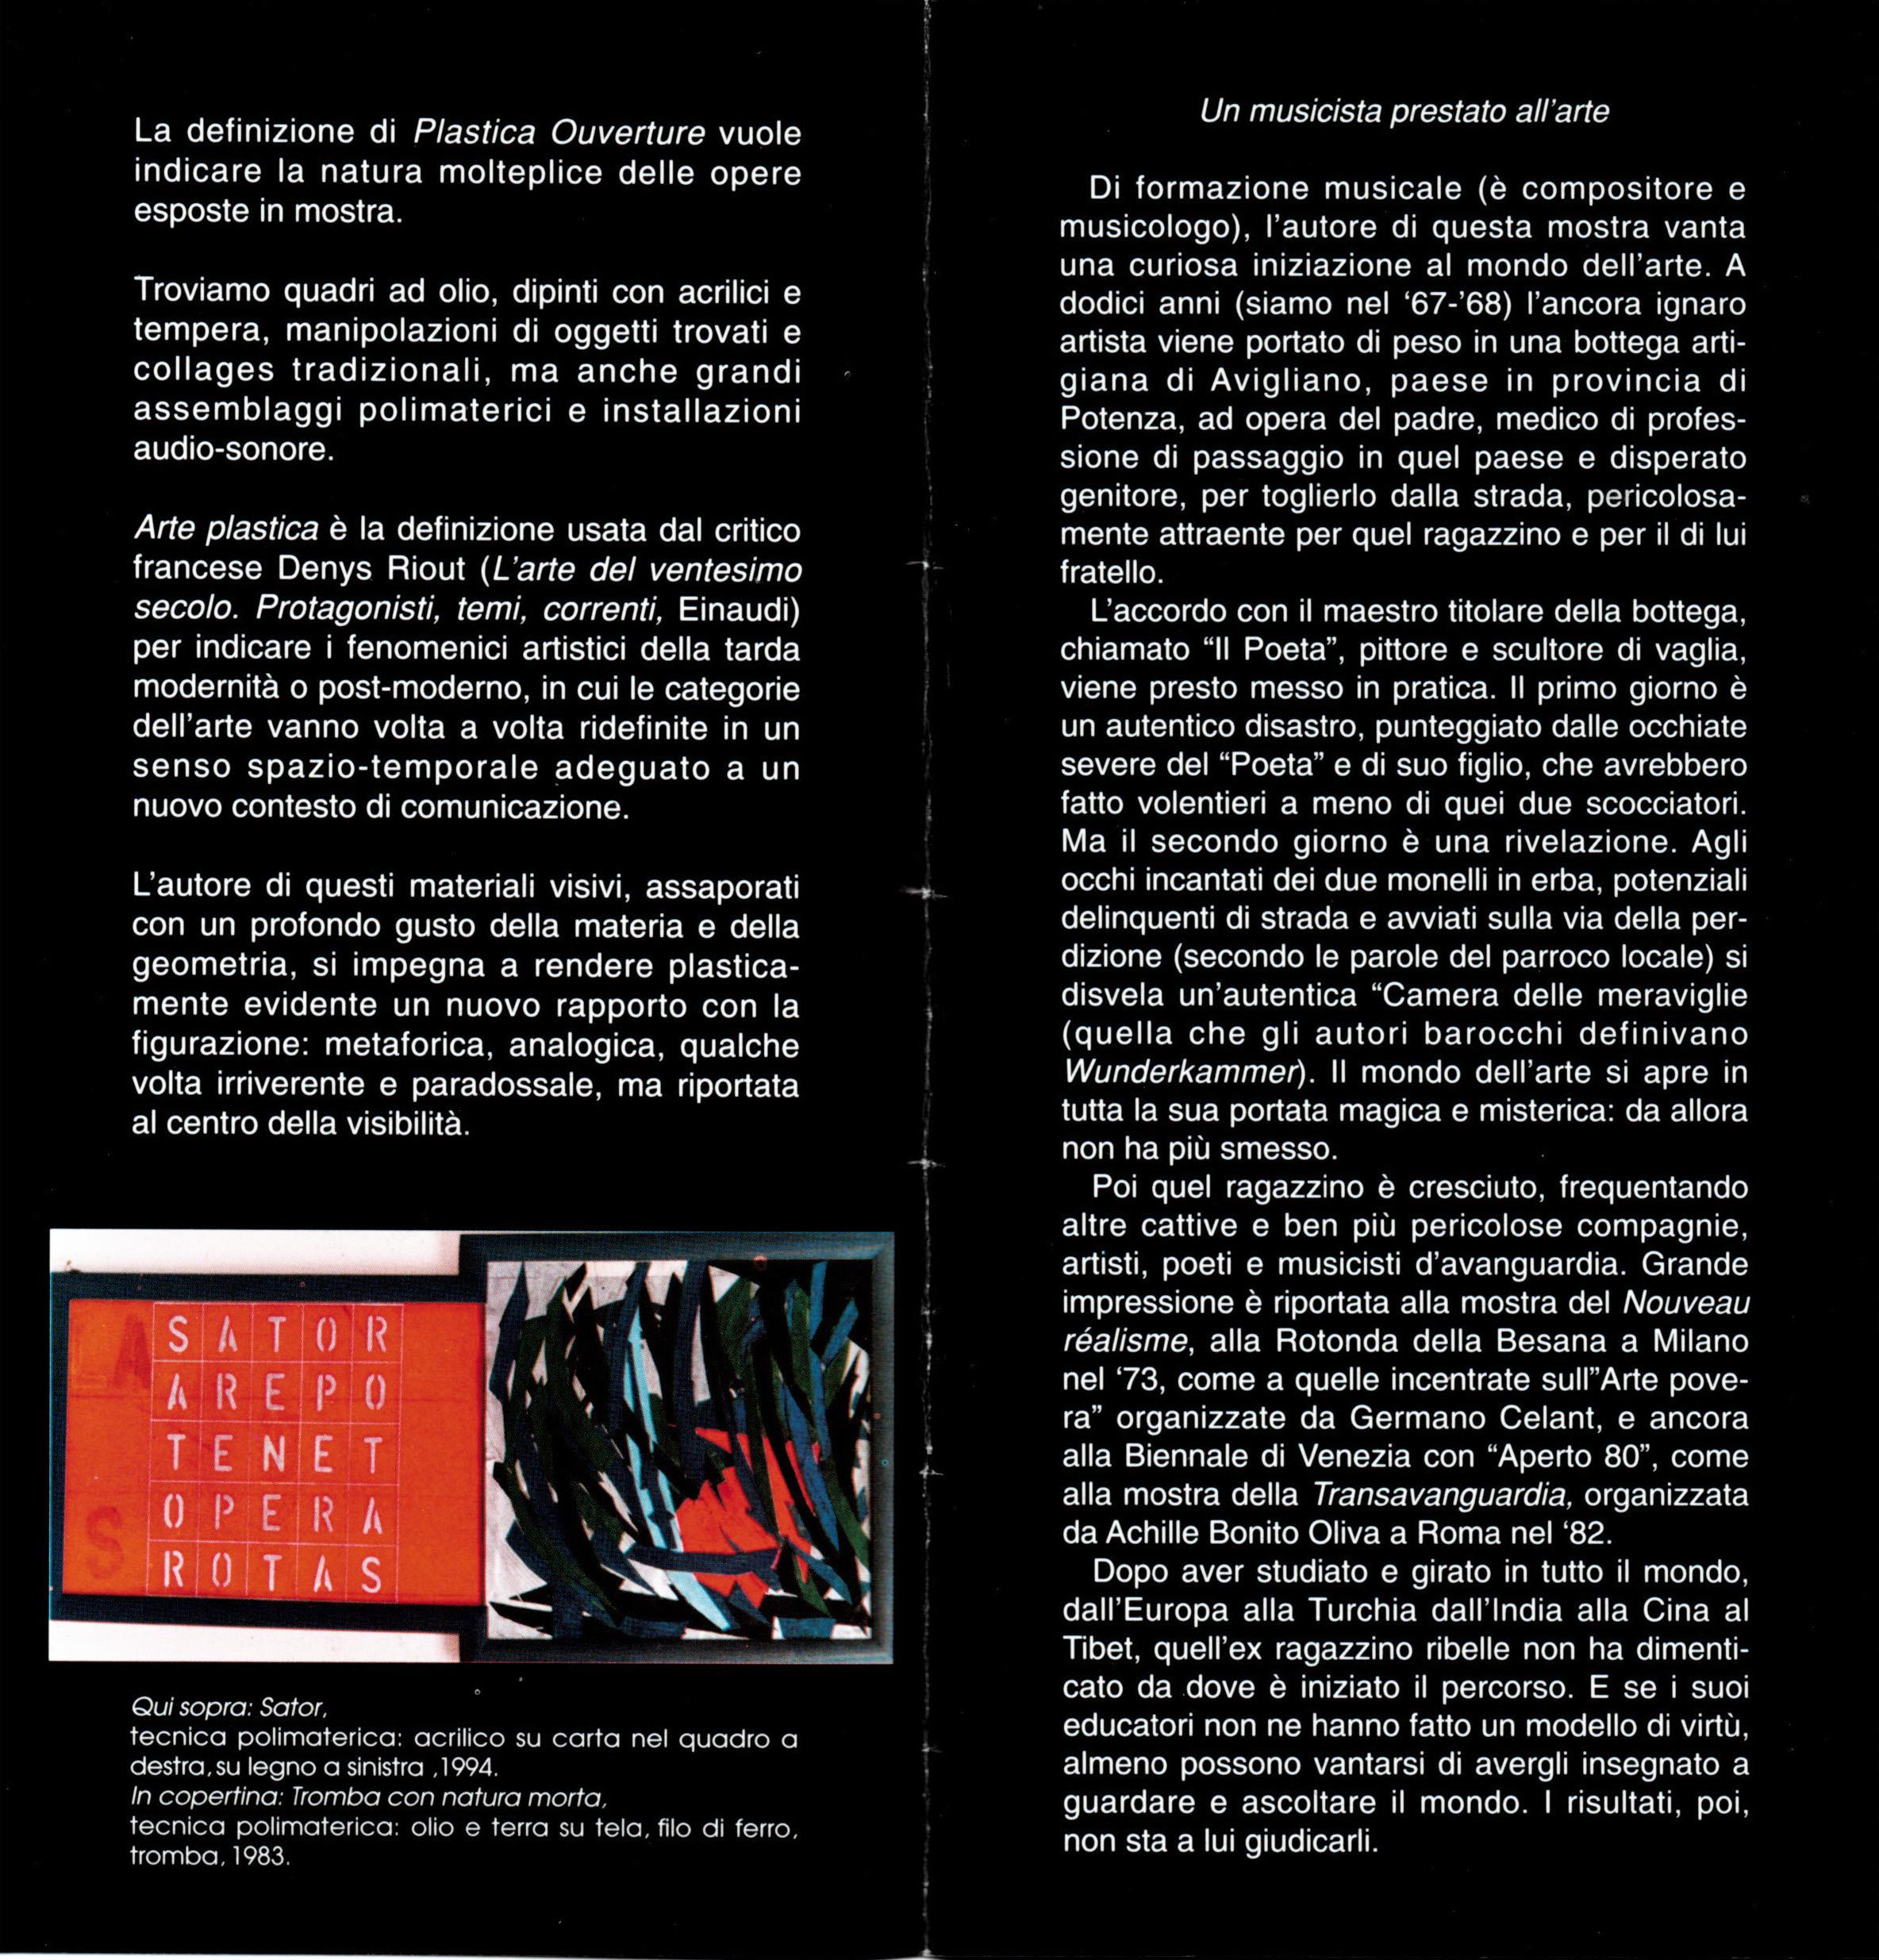 02- Seconda pagina